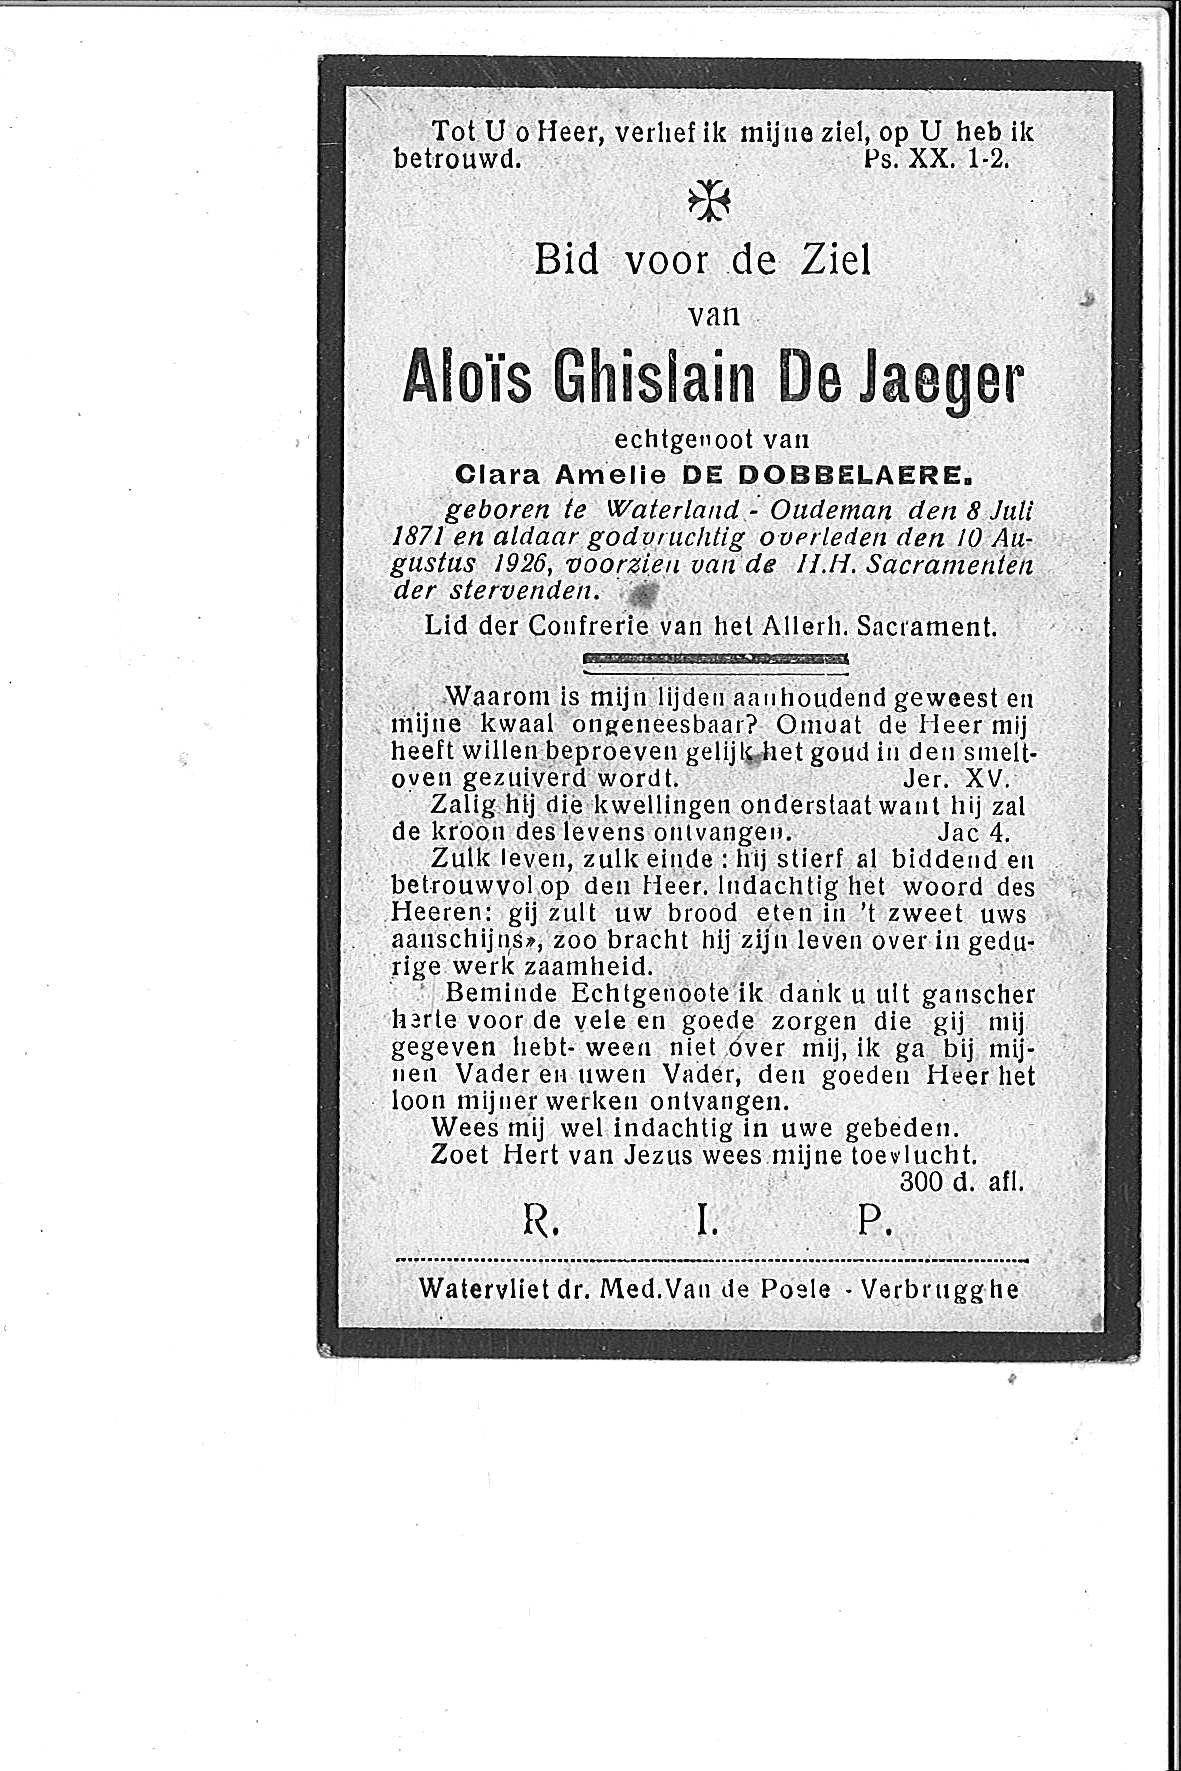 Aloïs-Ghislain(1926)20150422085139_00028.jpg